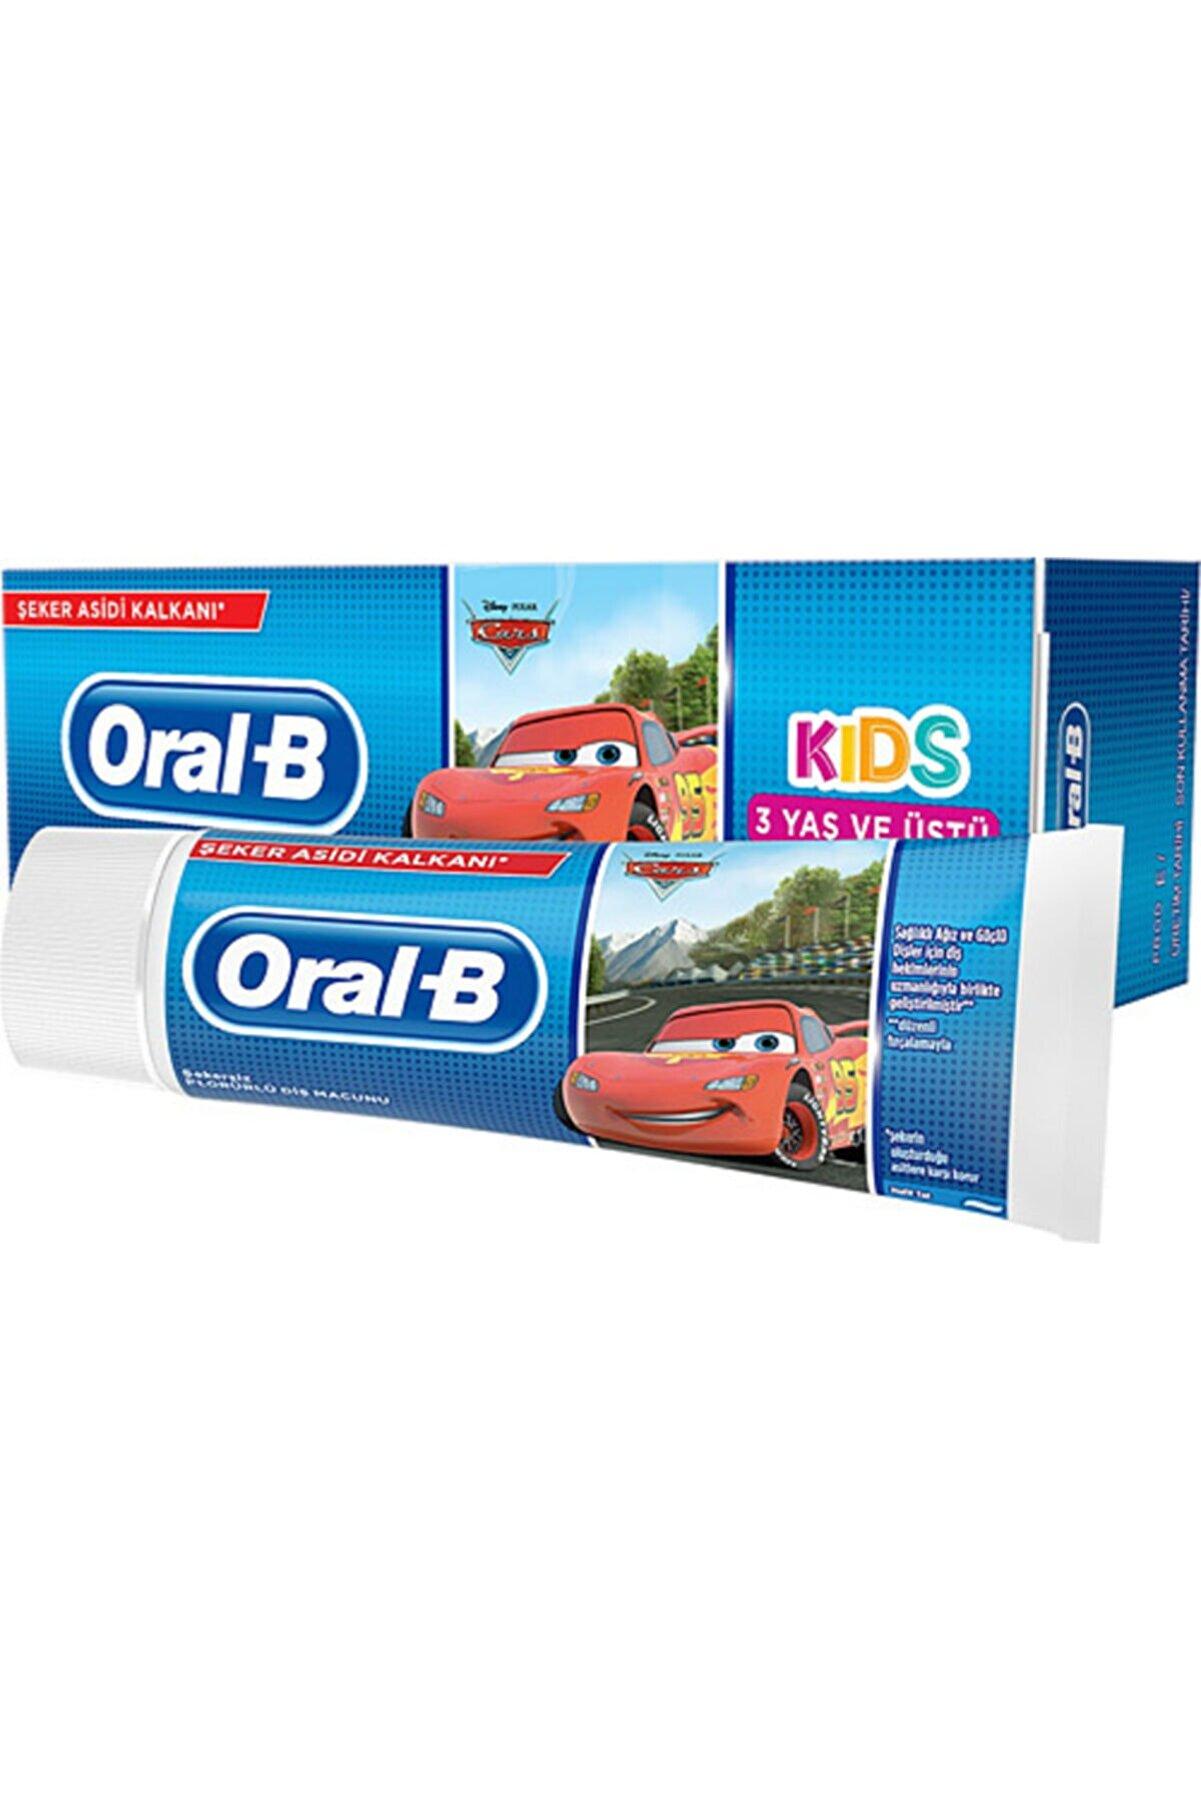 Oral-B Oral B Car Çocuk Diş Macunu 75 Ml 3 Yaş Ve Üstü